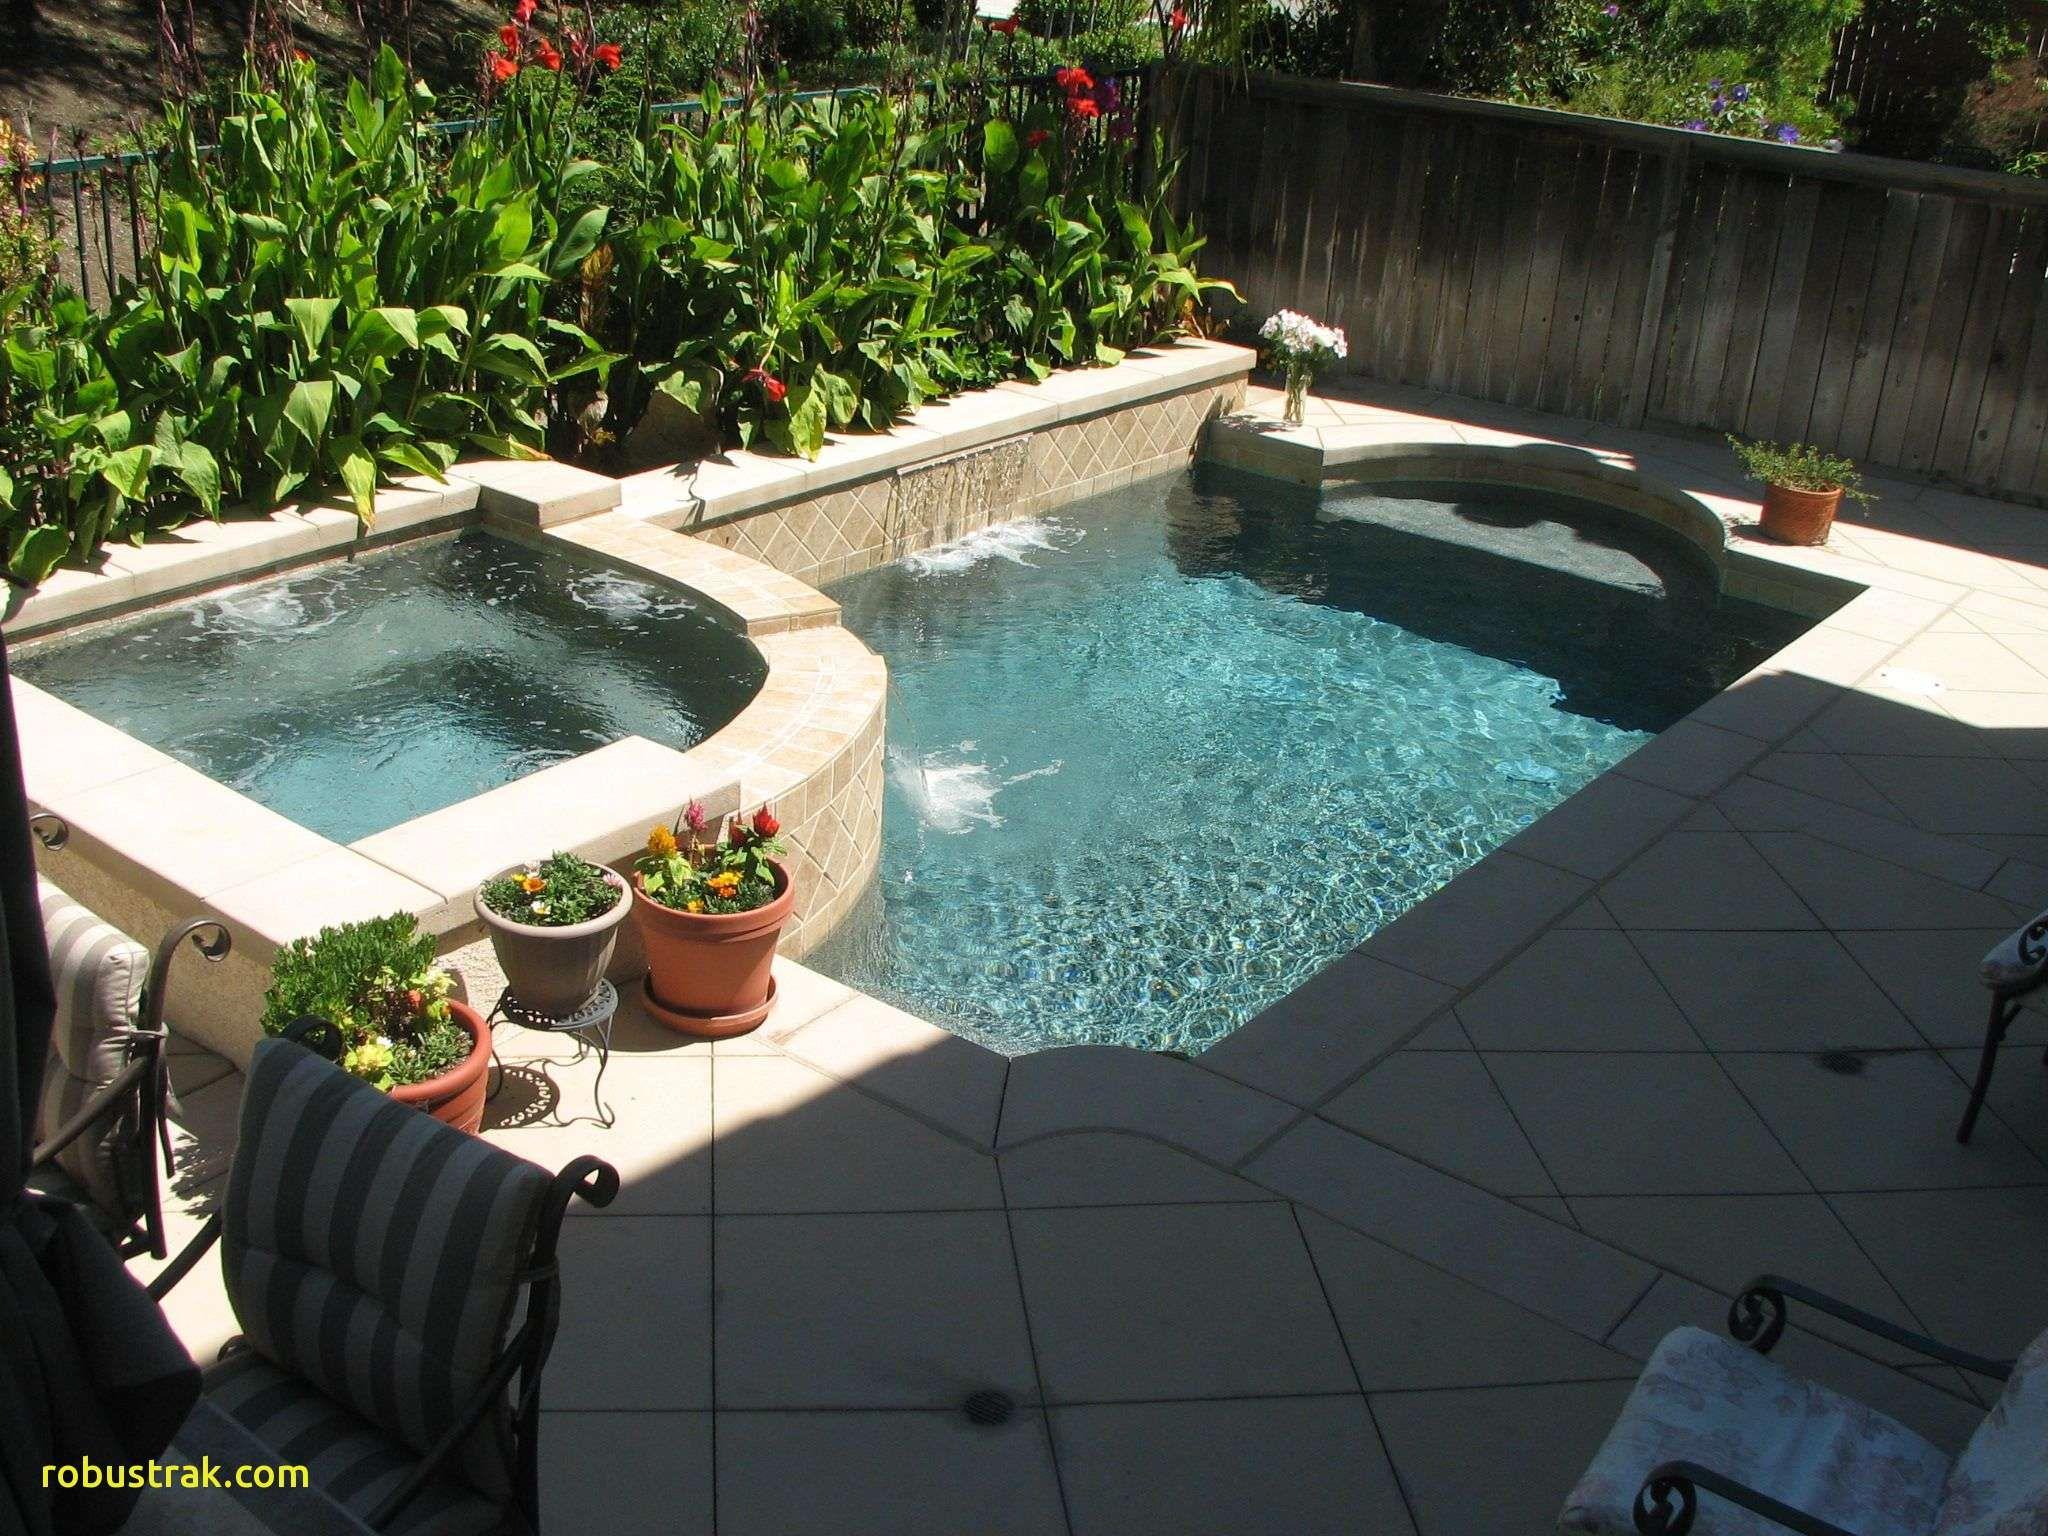 Beautiful Small Backyard Pools Https Robustrak Com Small Backyard Pools 2 Desain Kolam Kecil Kolam Renang Halaman Belakang Desain Kolam Renang